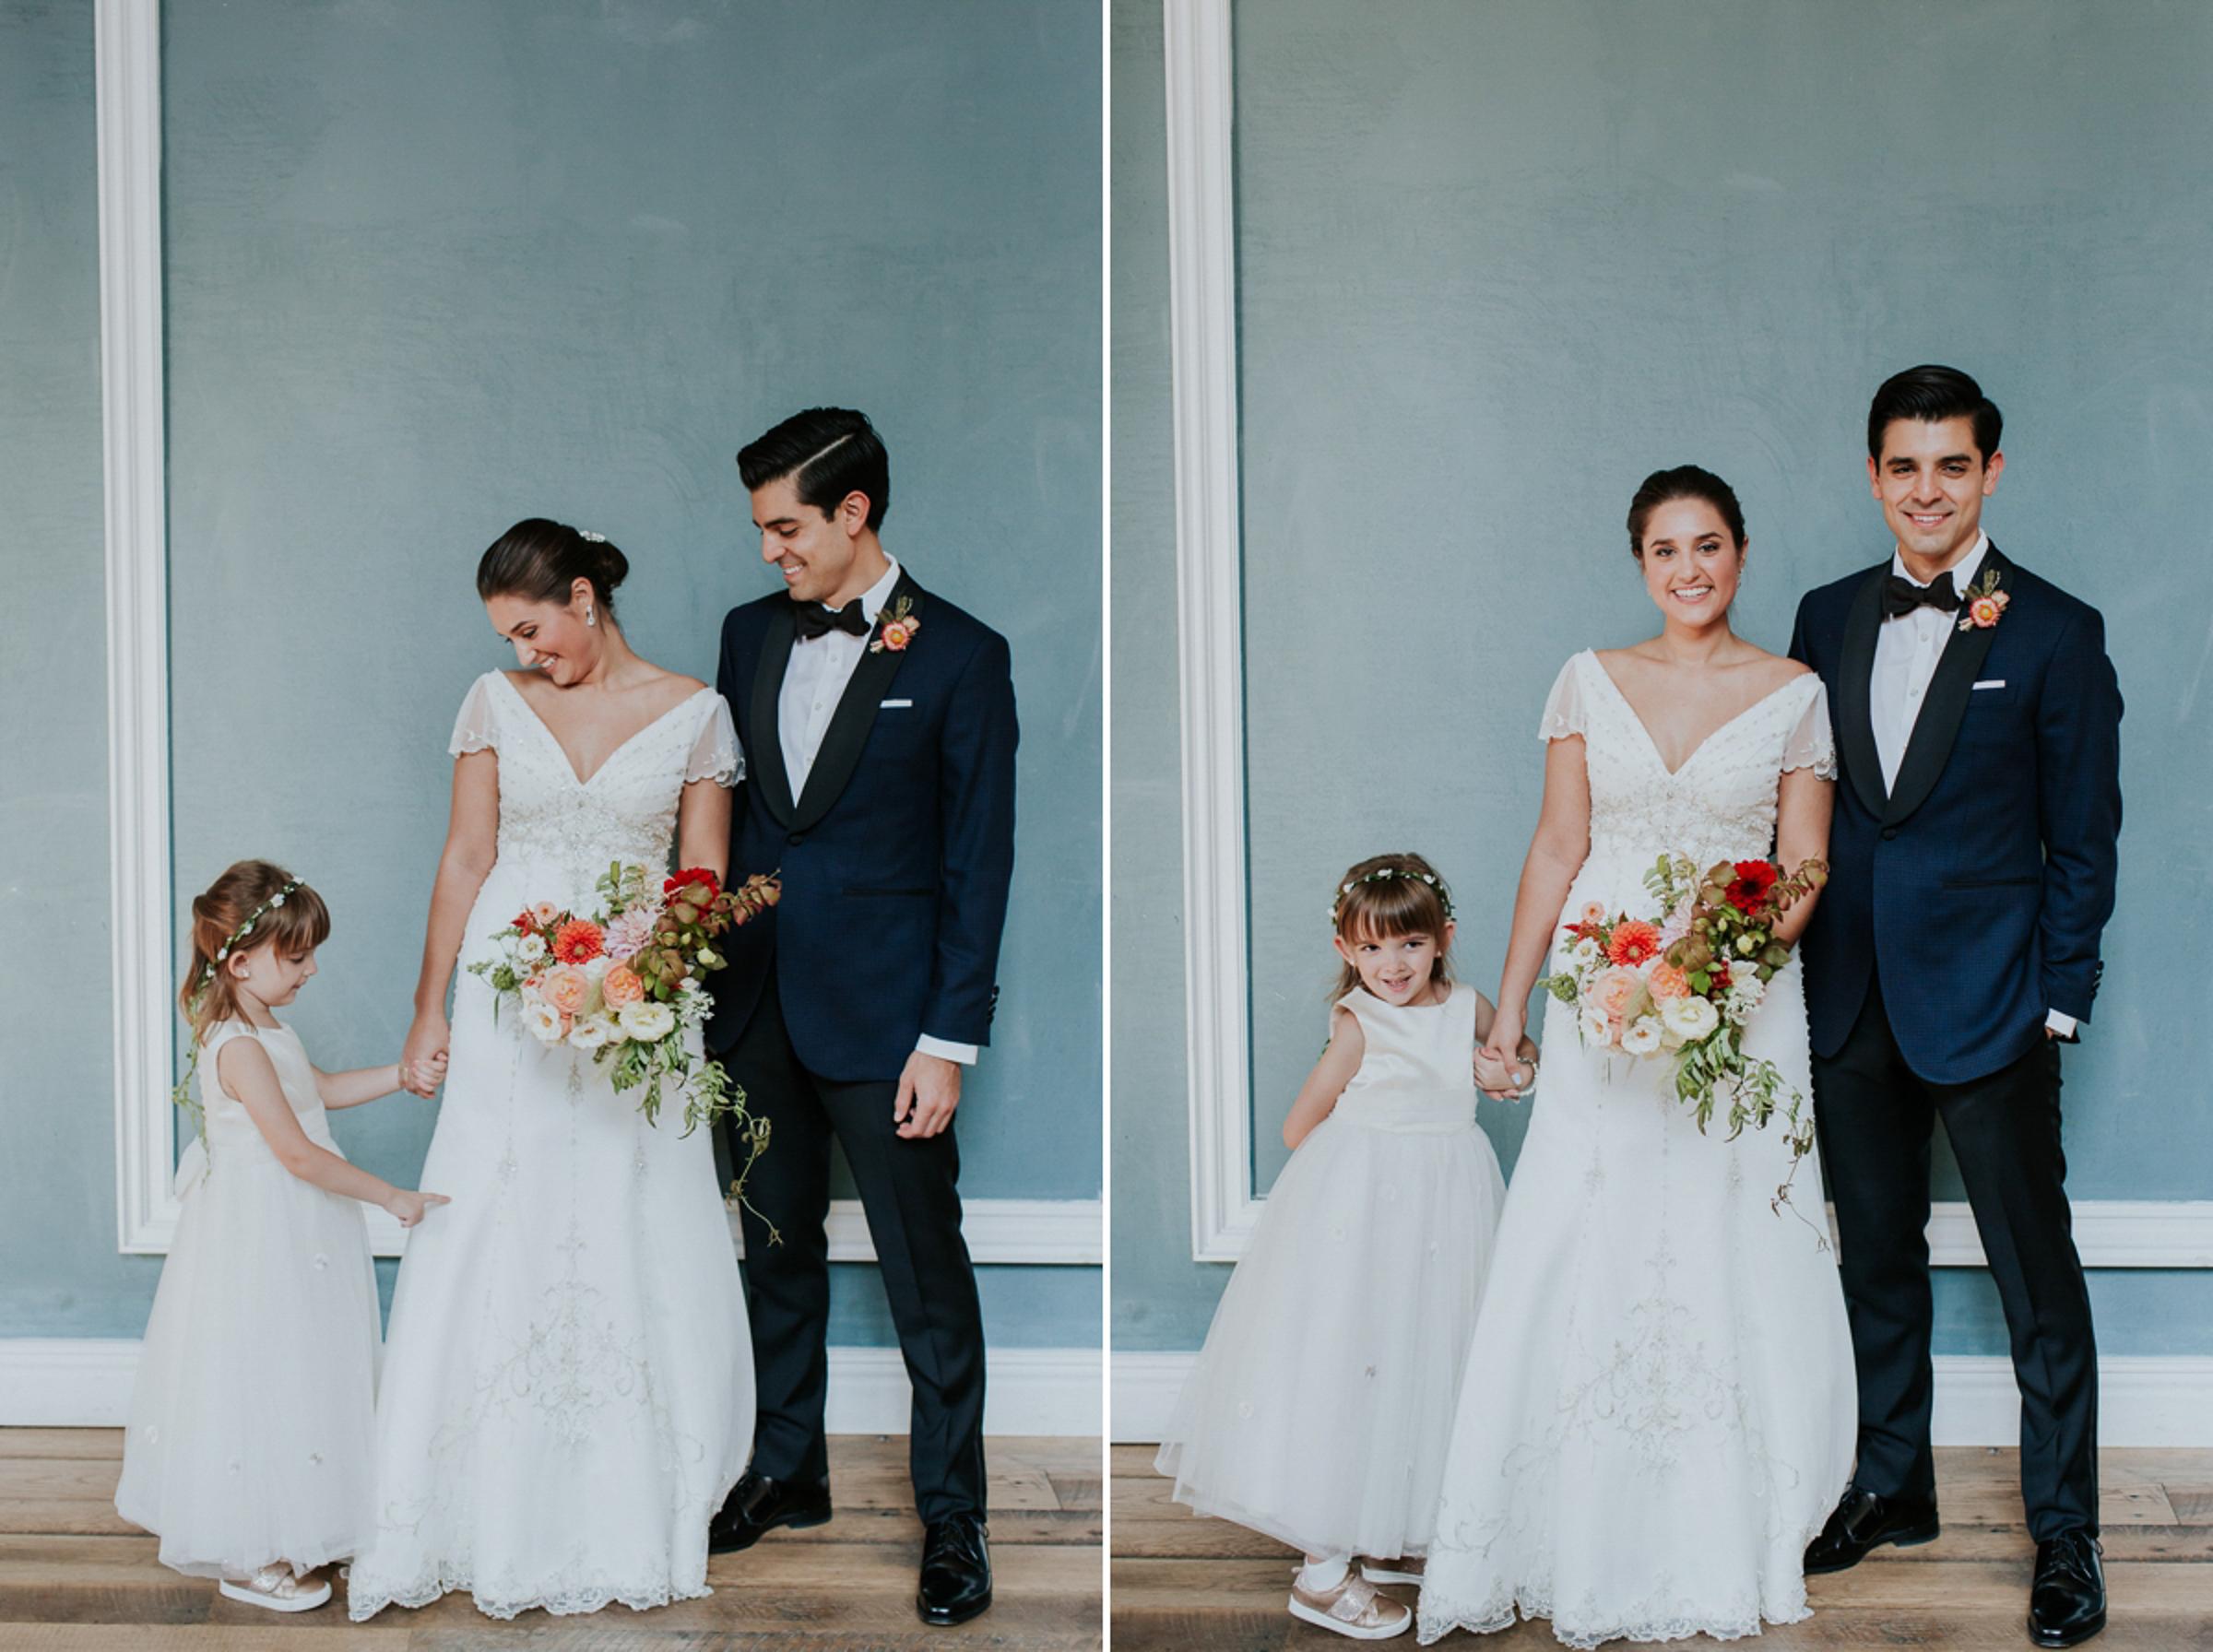 Brooklyn-Winery-NYC-Editorial-Documentary-Wedding-Photographer-Gina-Oli-121.jpg